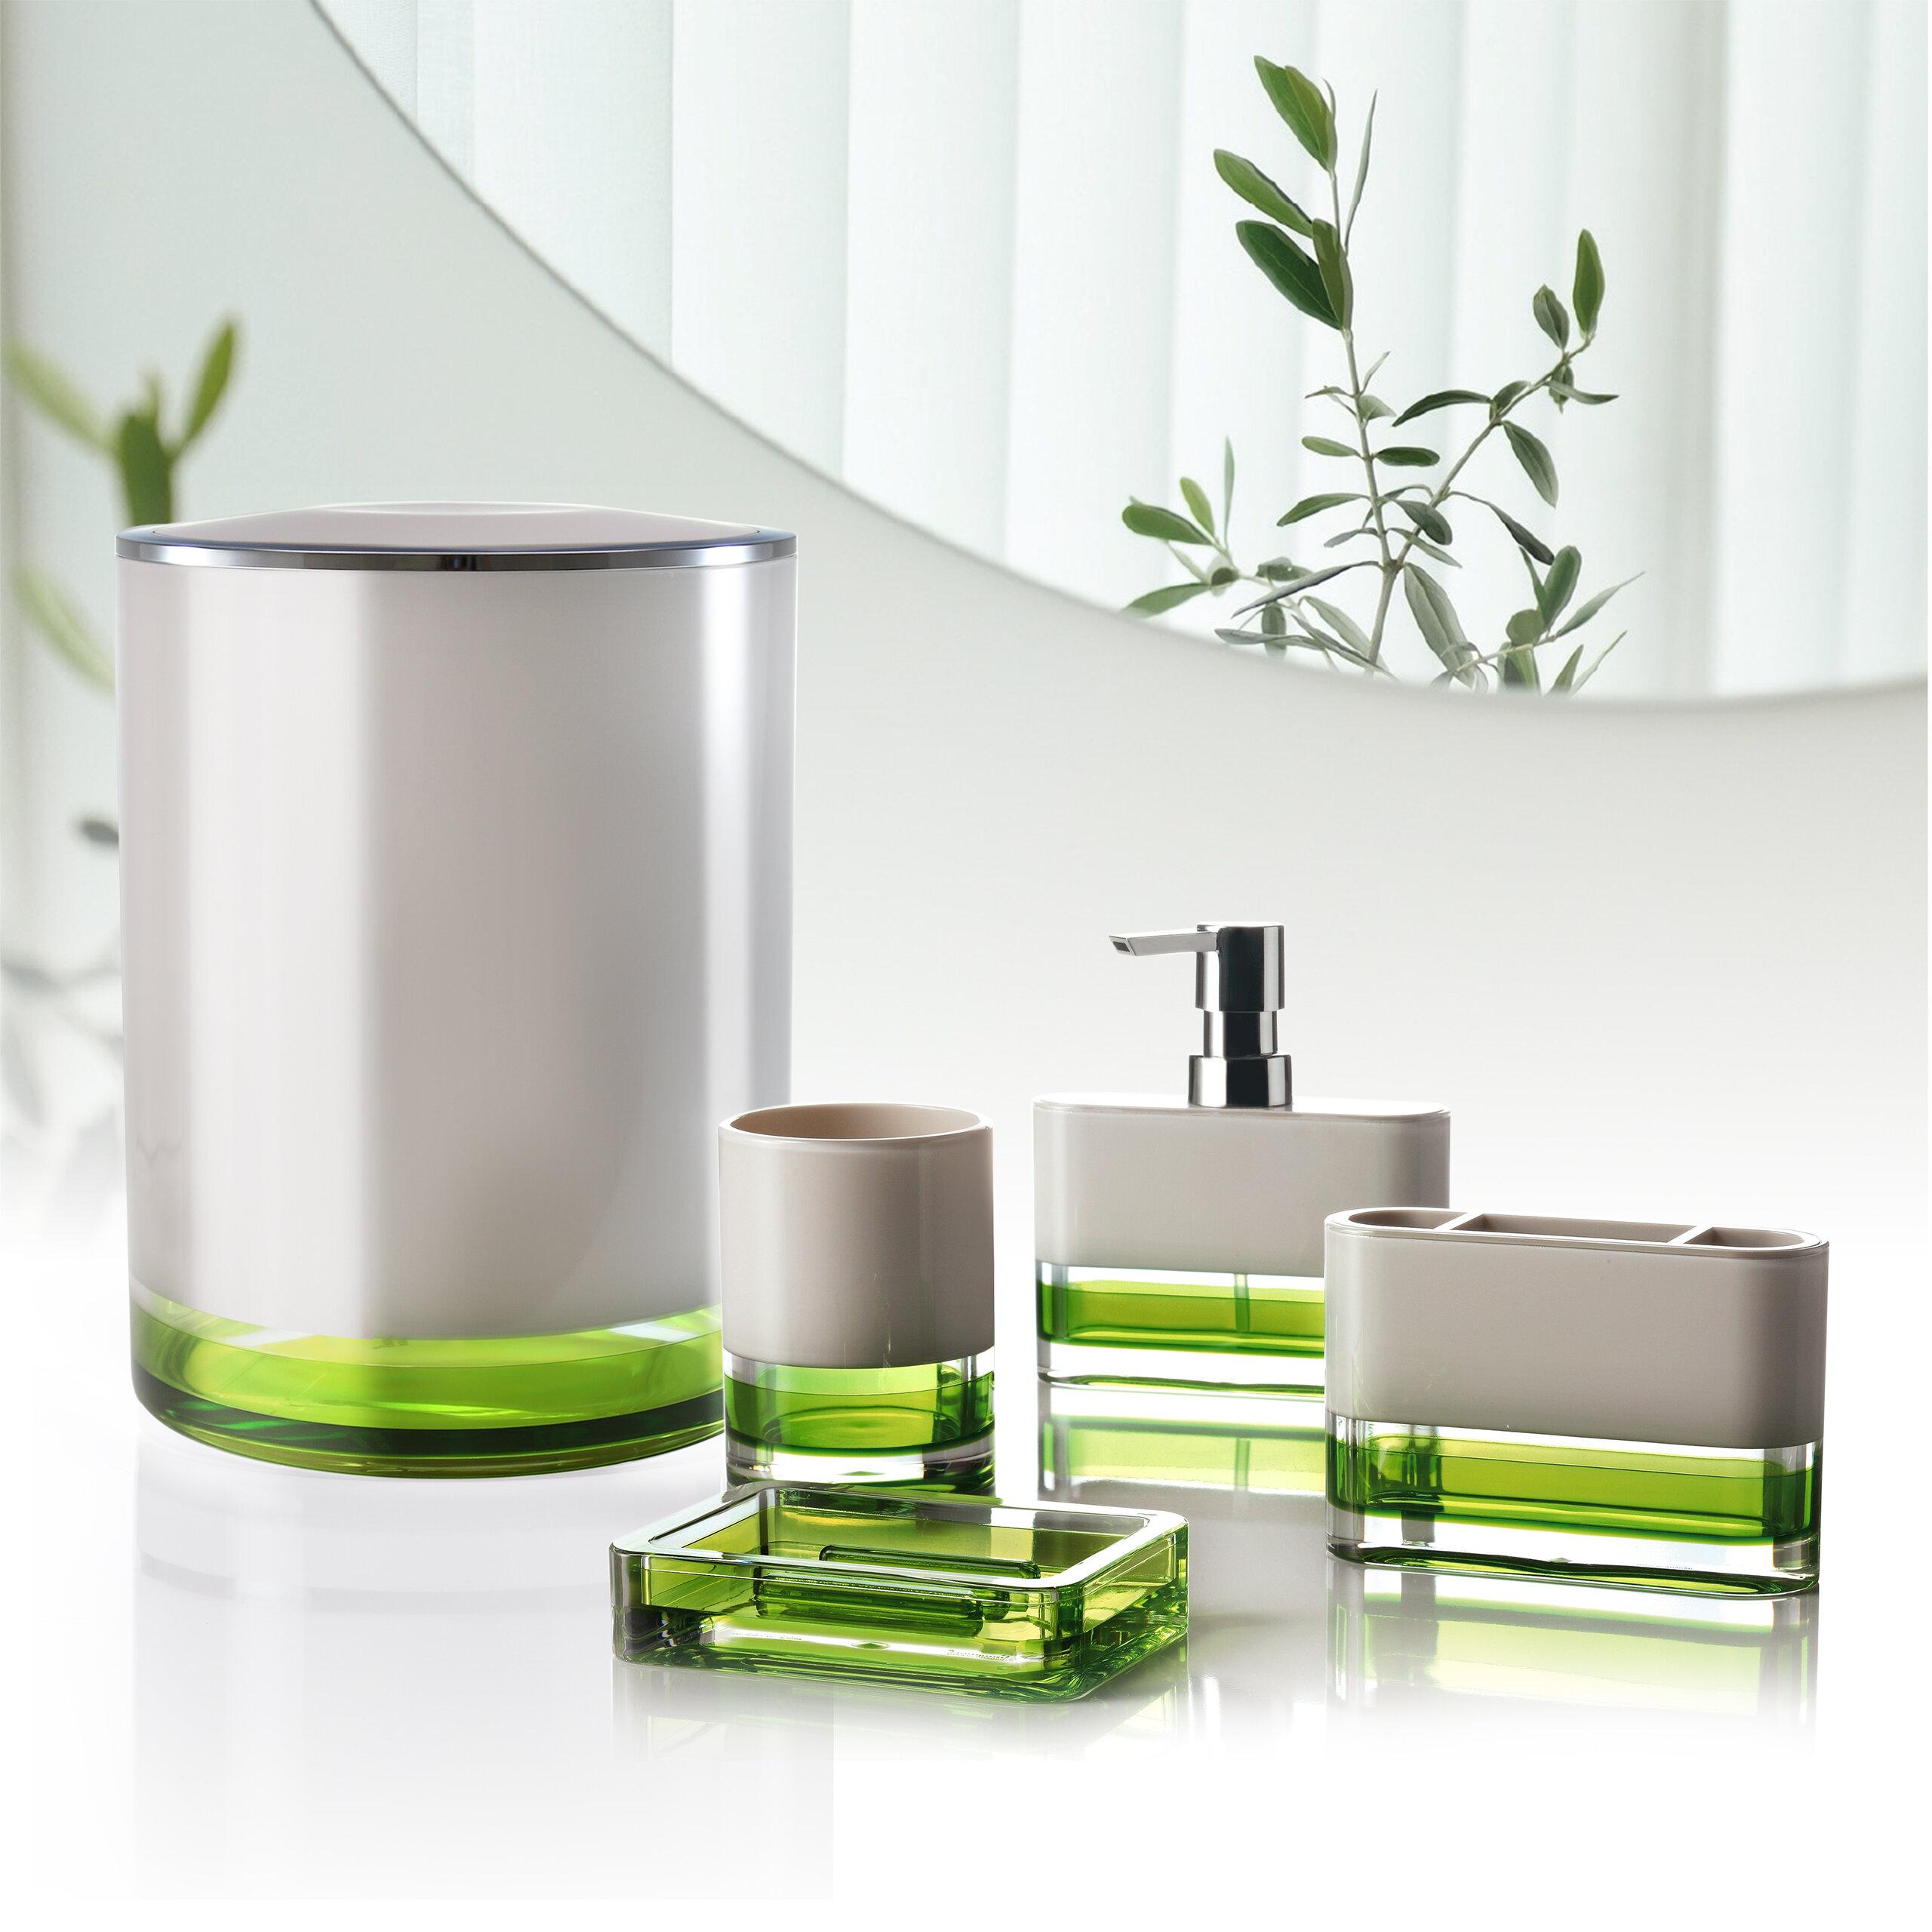 Tatara Group 5 Piece Bathroom Accessories Set